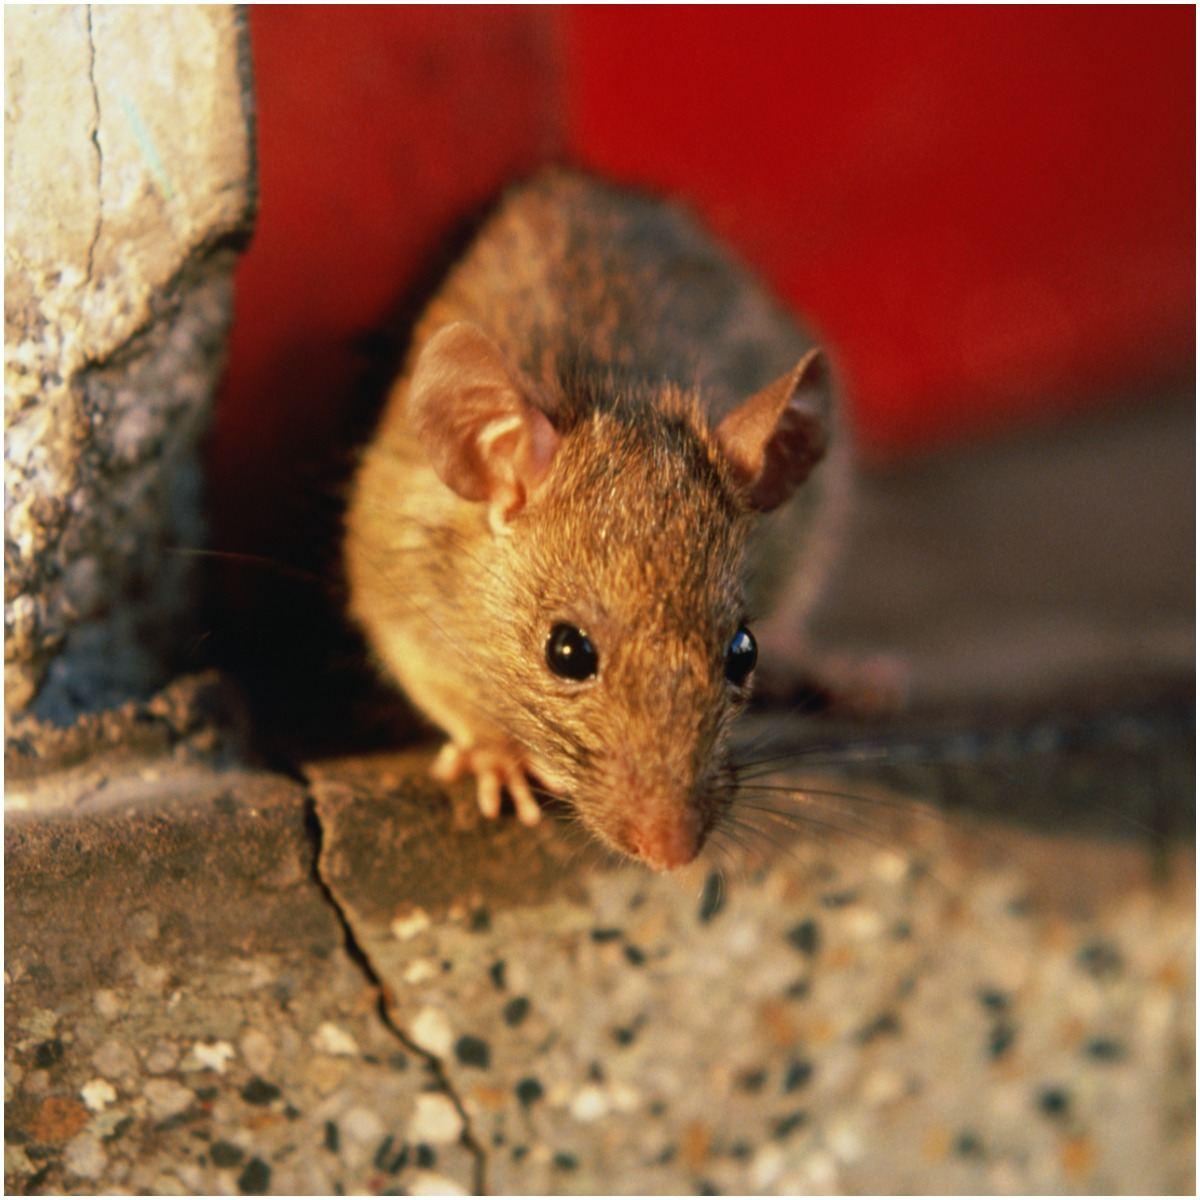 Rat Symbolism, Dreams, and Messages